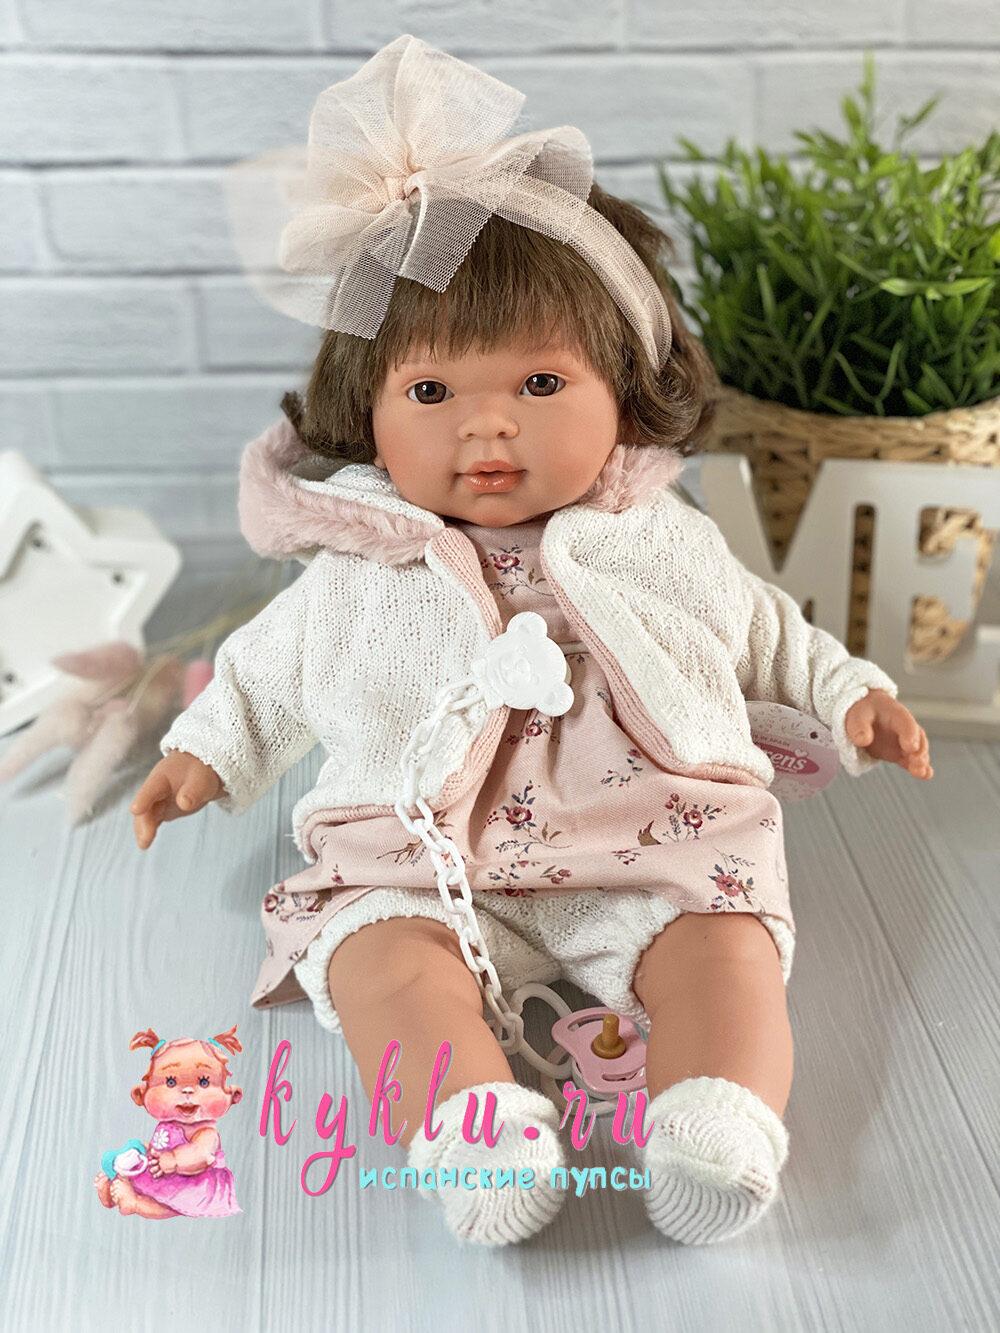 Кукла Пиппа с карими глазками